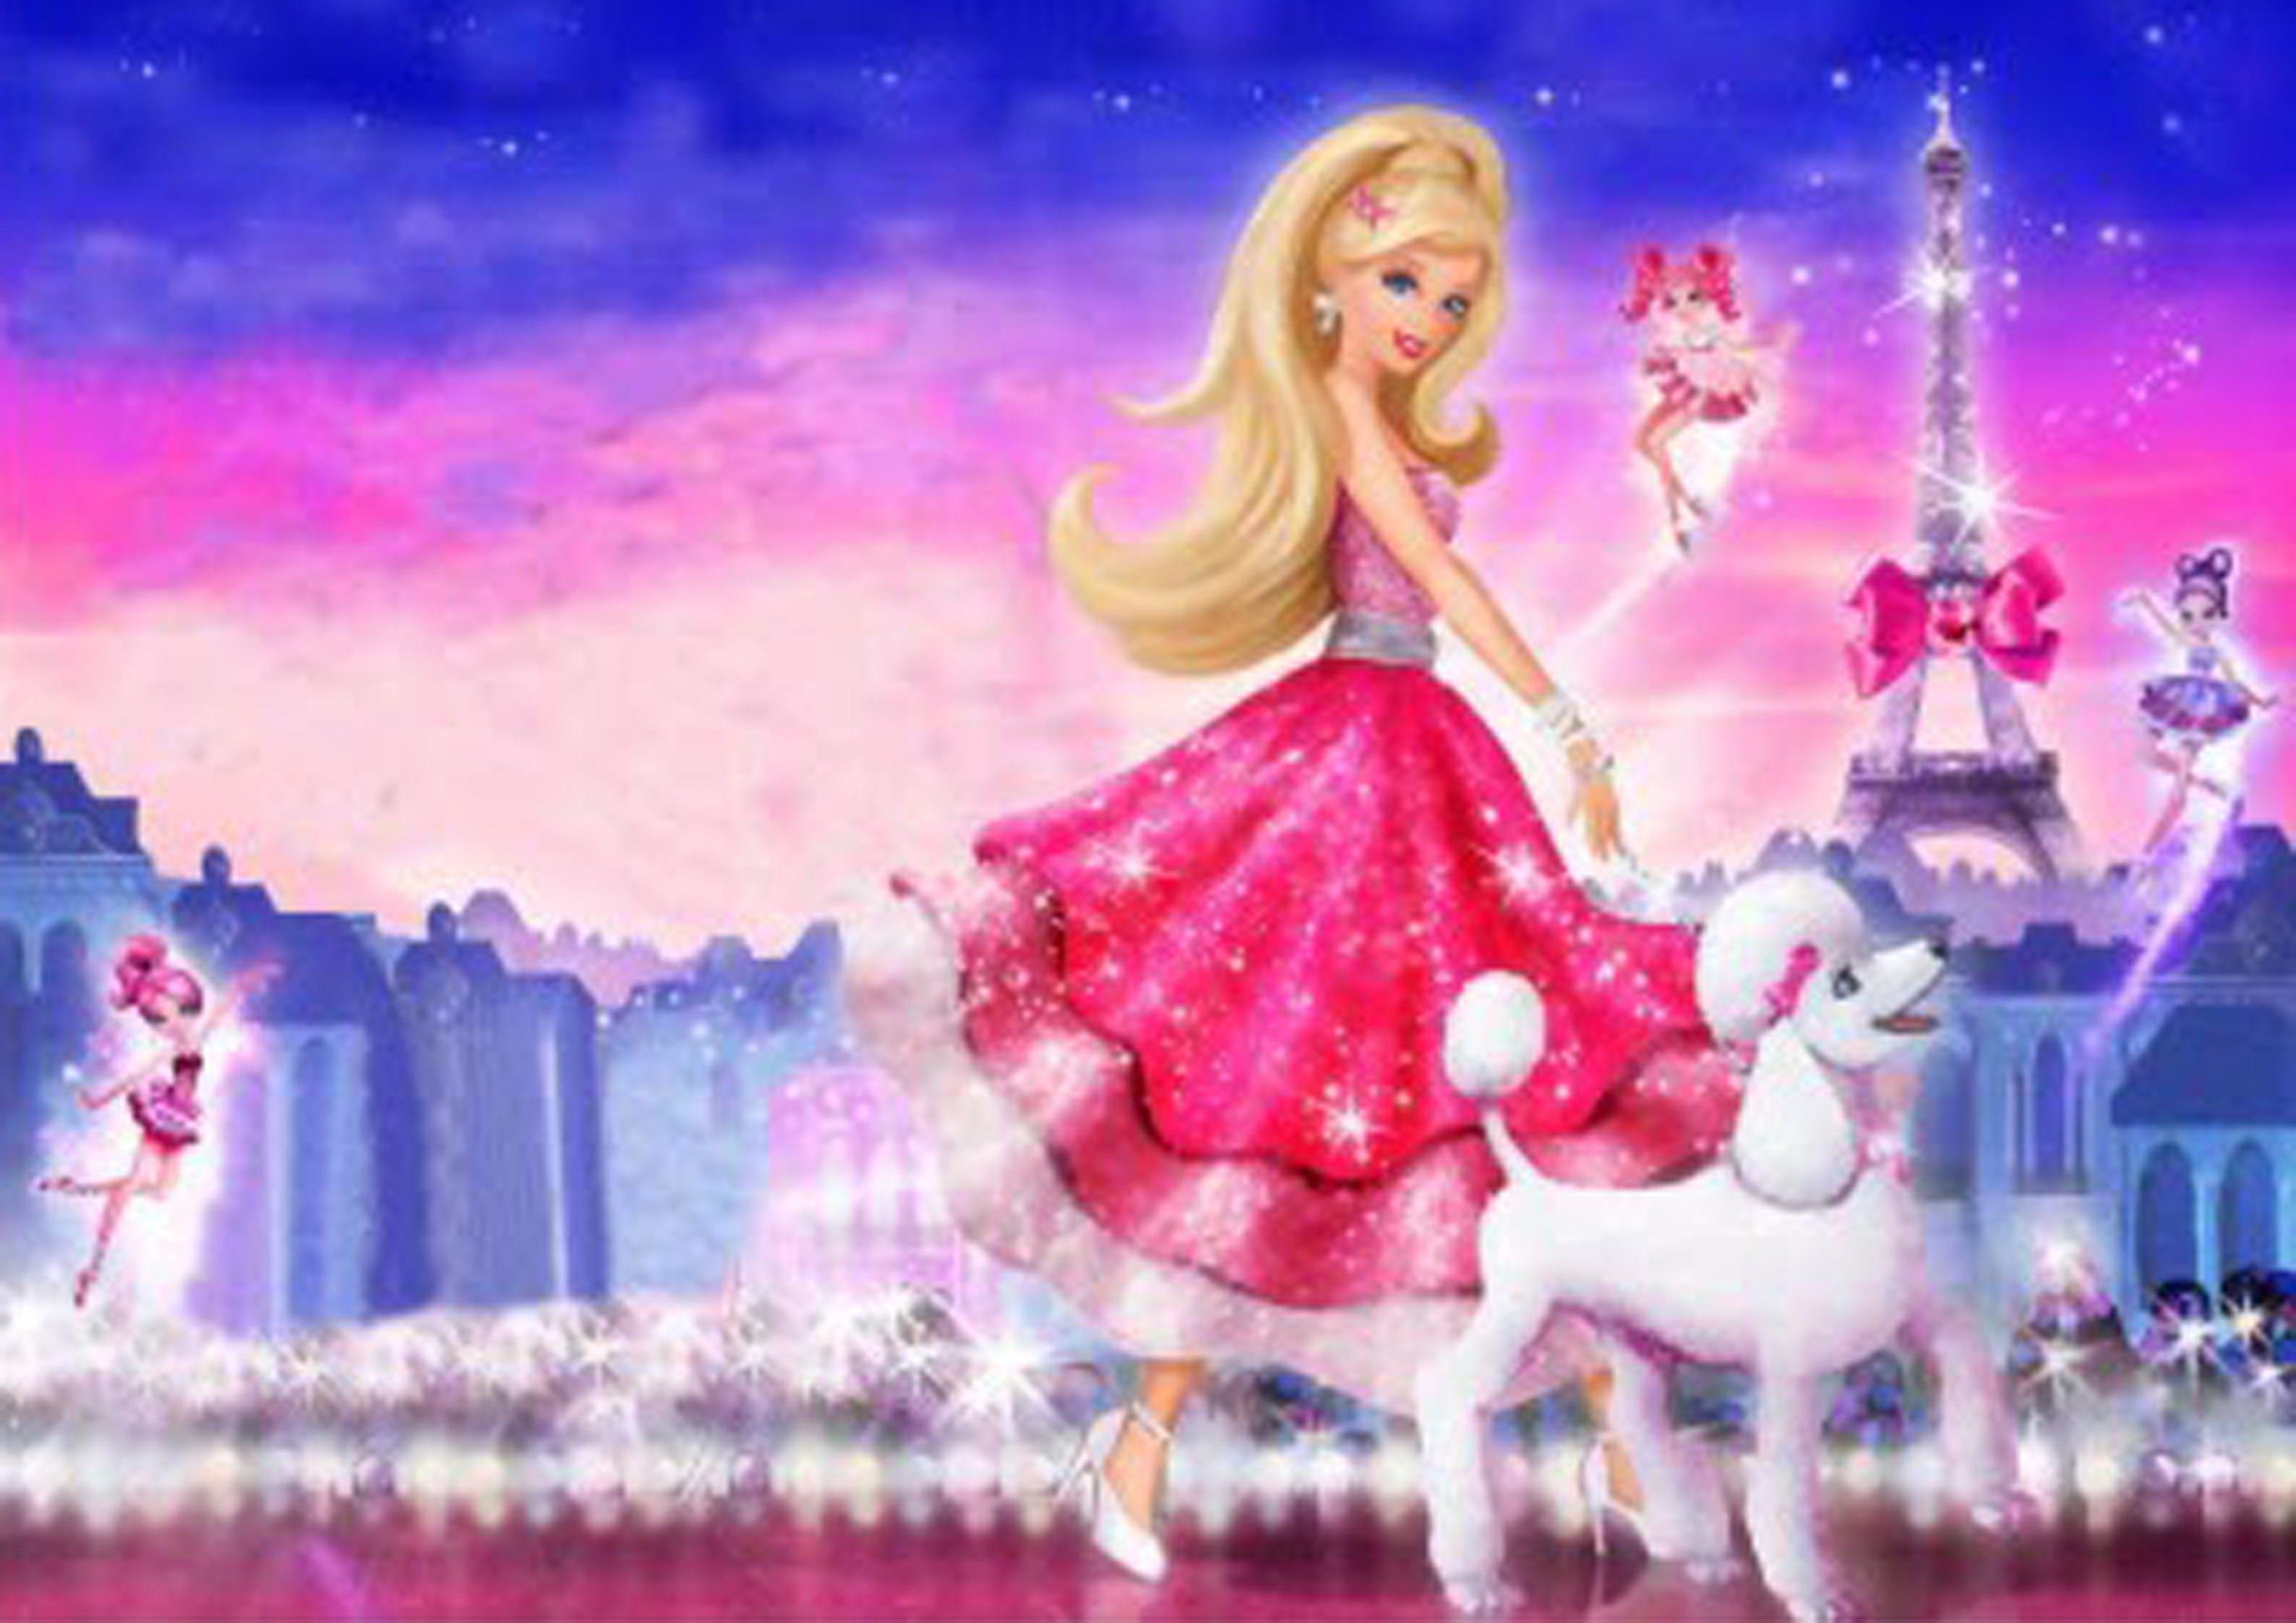 Barbie Doll Cartoon Wallpaper Download